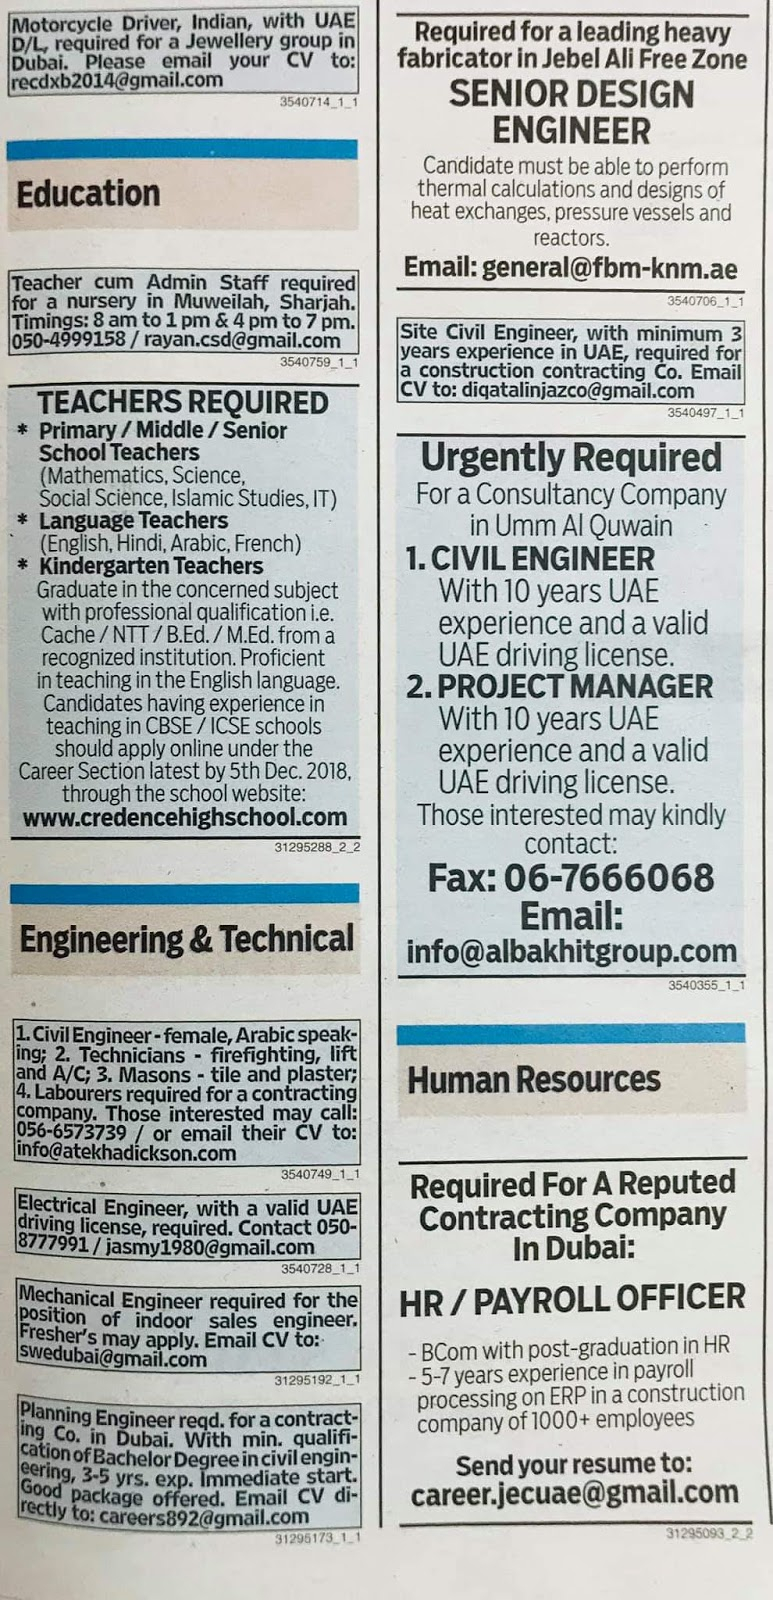 gulf news jobs classifieds 27/11/2018 - وظائف شاغرة فى الامارات